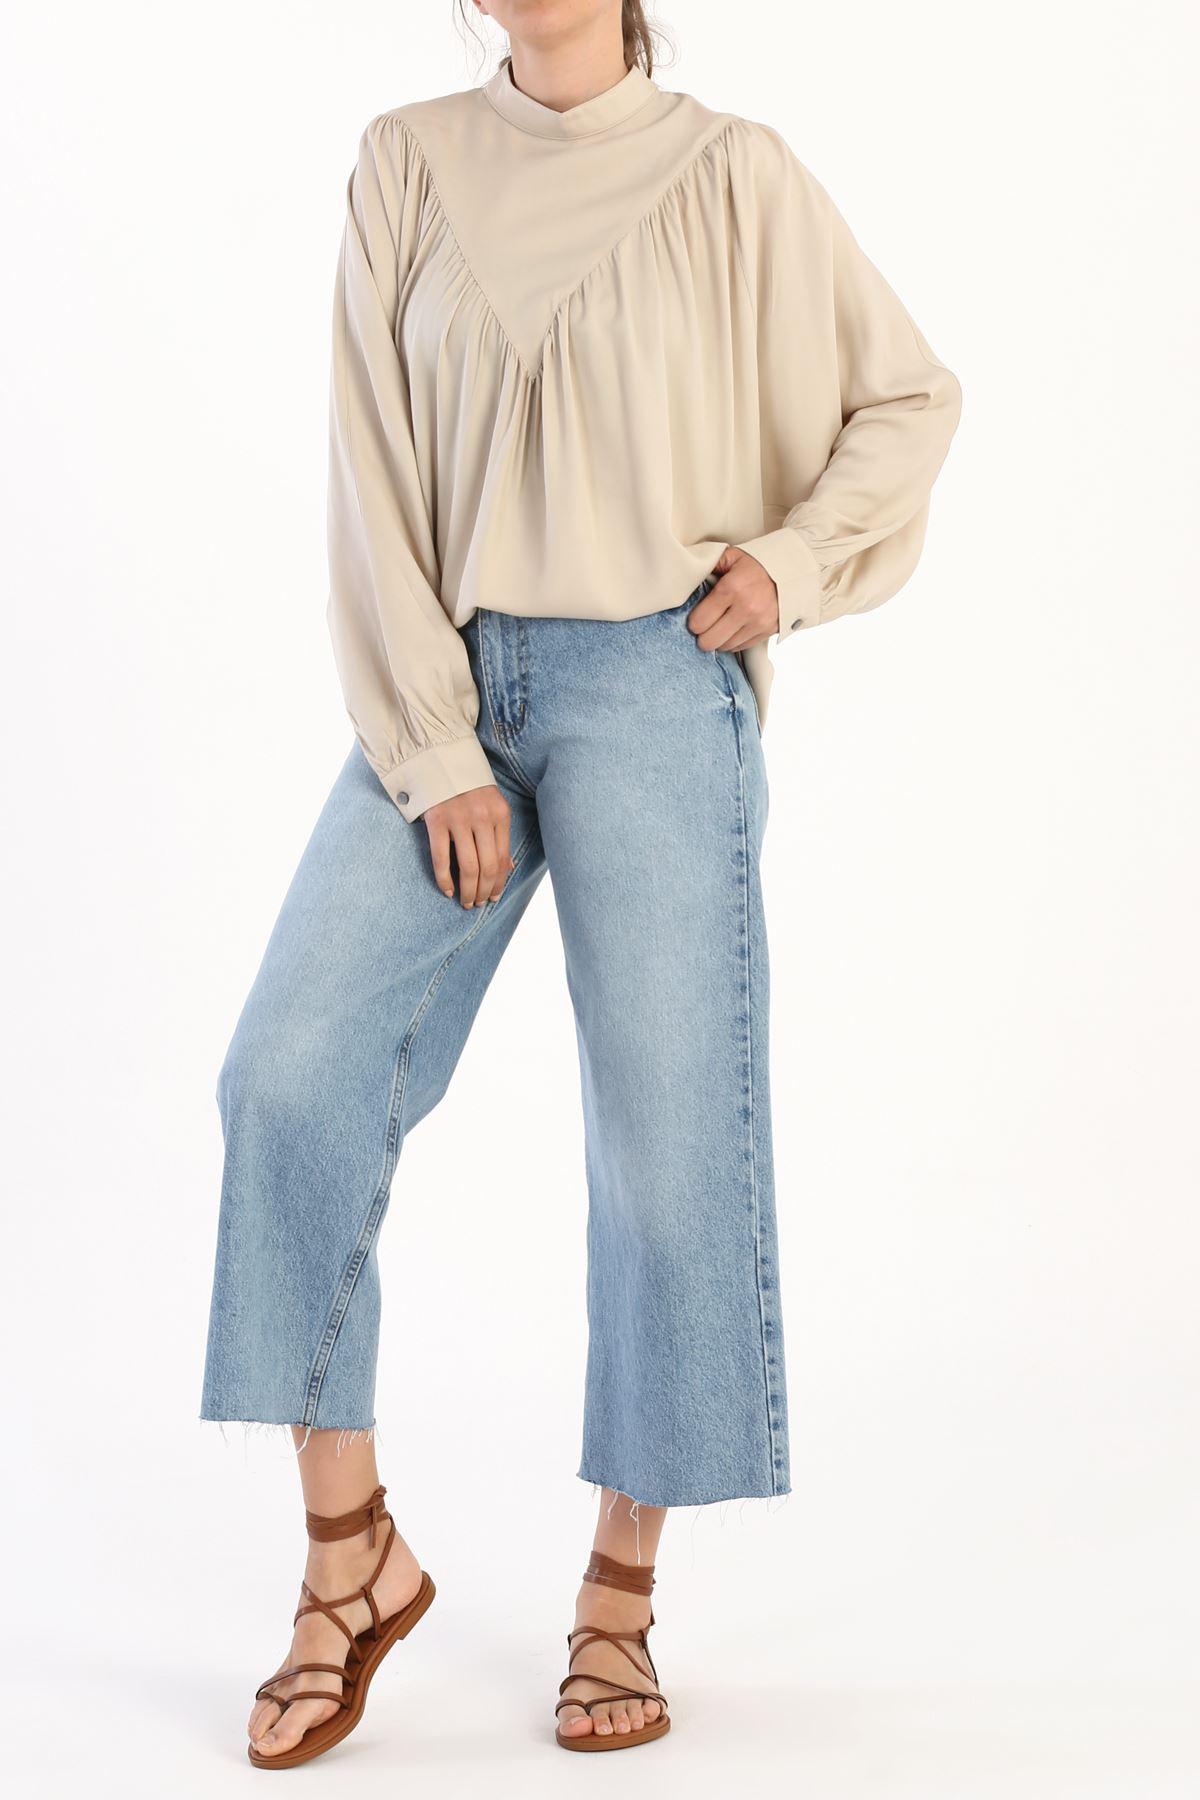 Kadın Büzgülü Salaş Bluz-bej